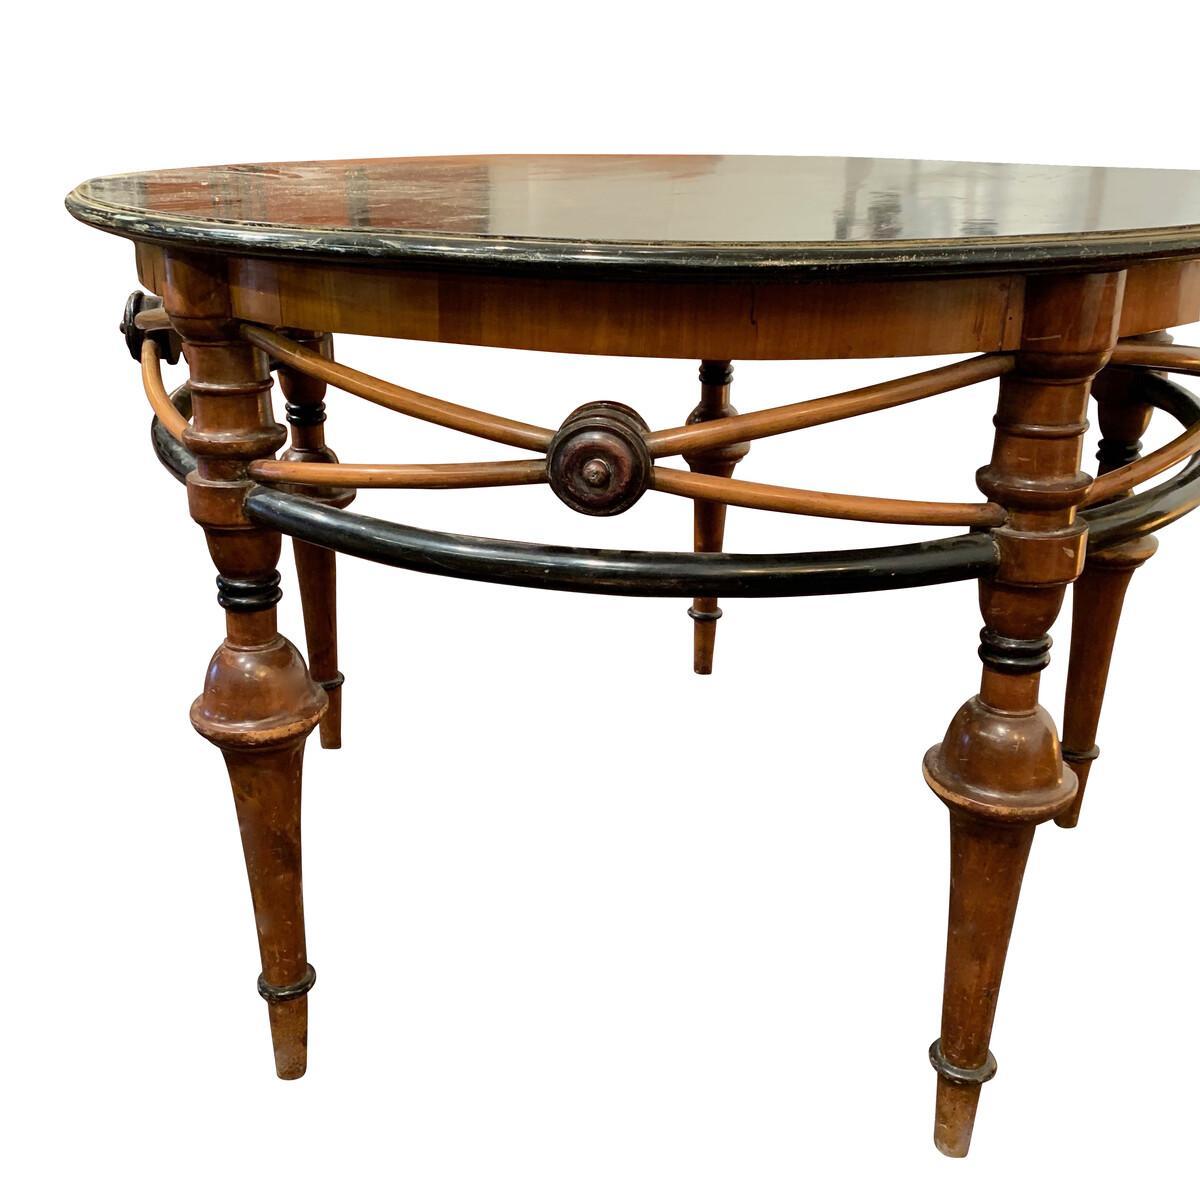 Etonnant 19th Century Belle Époque Center Hall Table, France